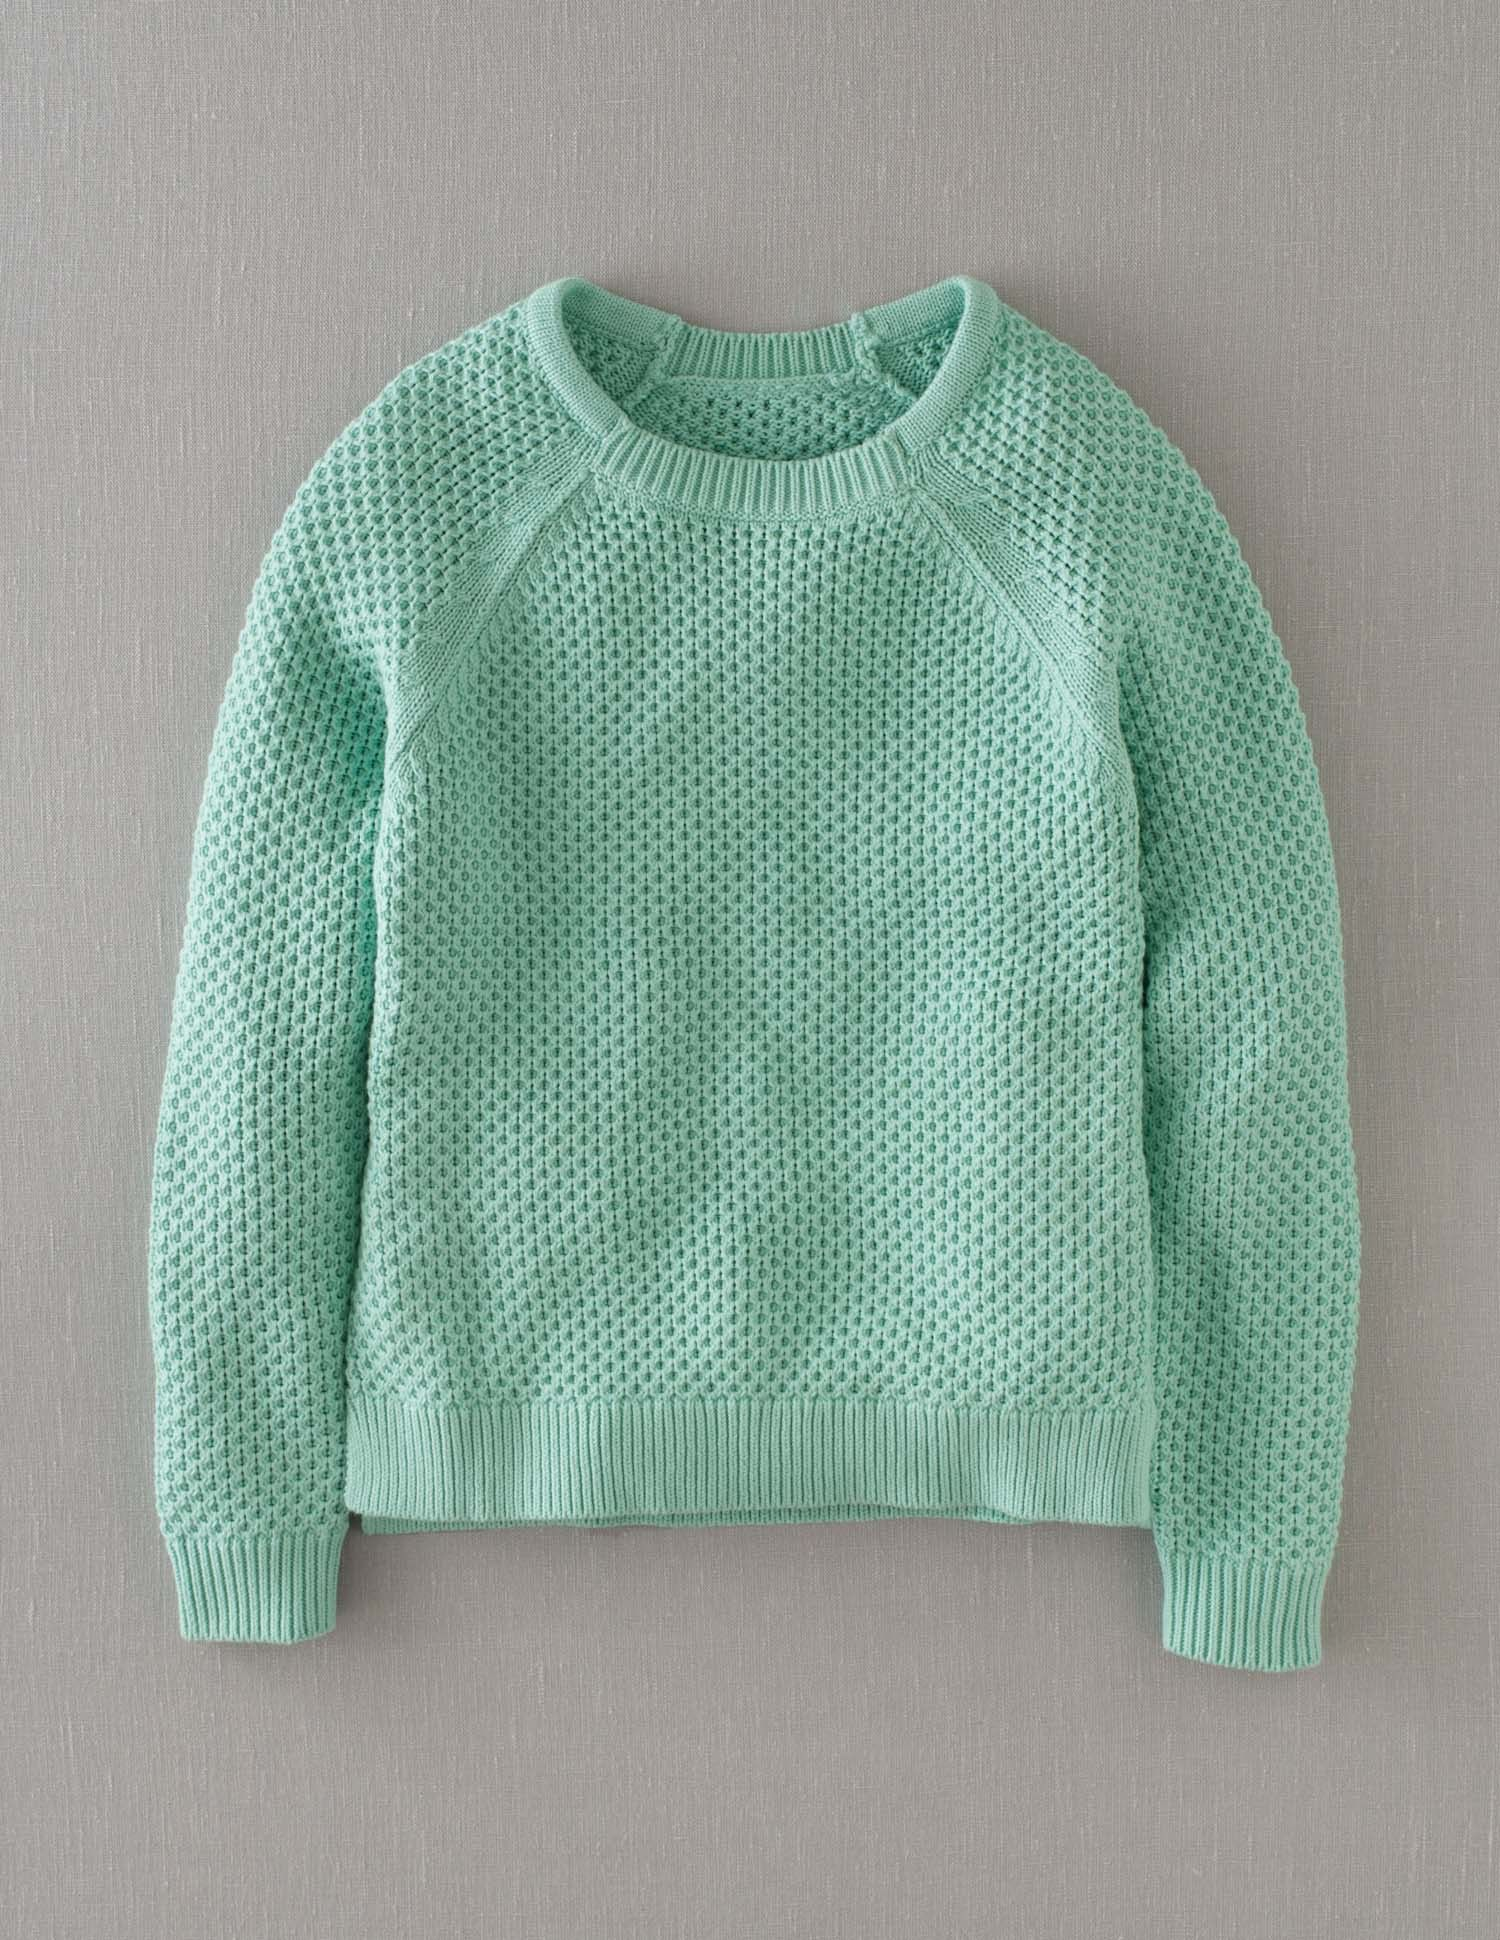 Boden Cotton Stitch Sweater $88   Textural Sweaters   Pinterest ...